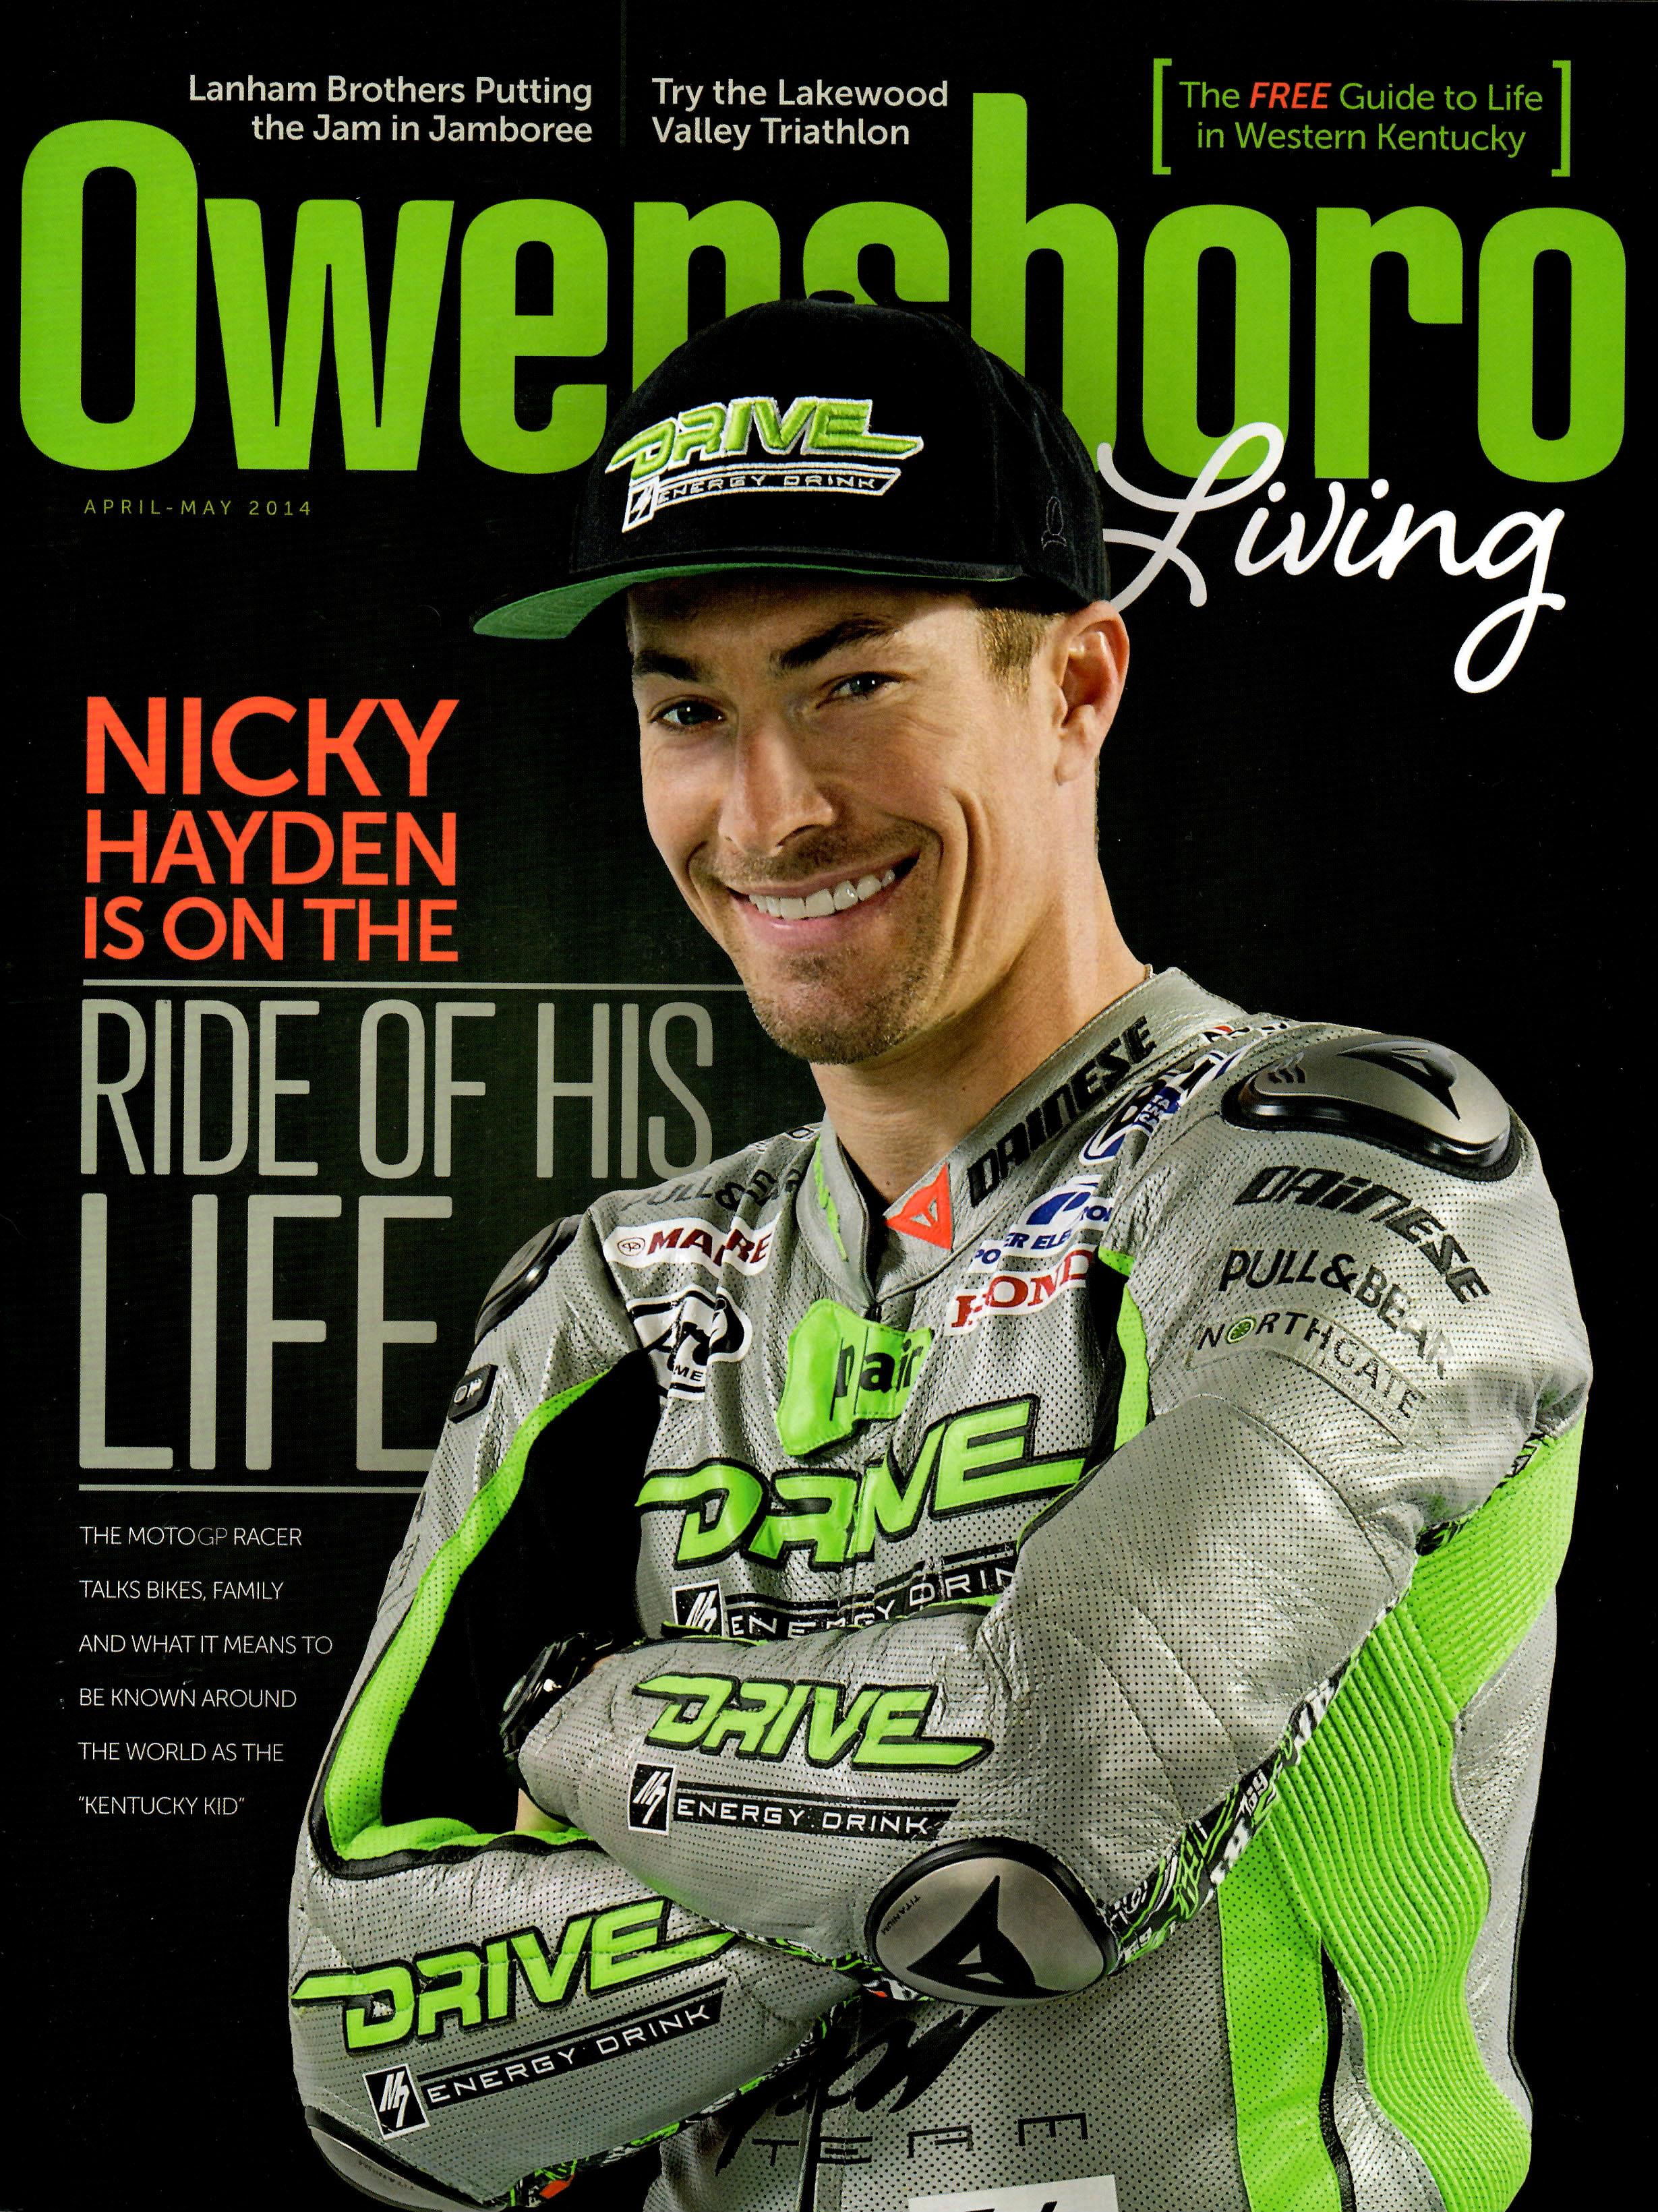 Lakewood Valley Triathlon    Owensboro Living magazine - April 2014